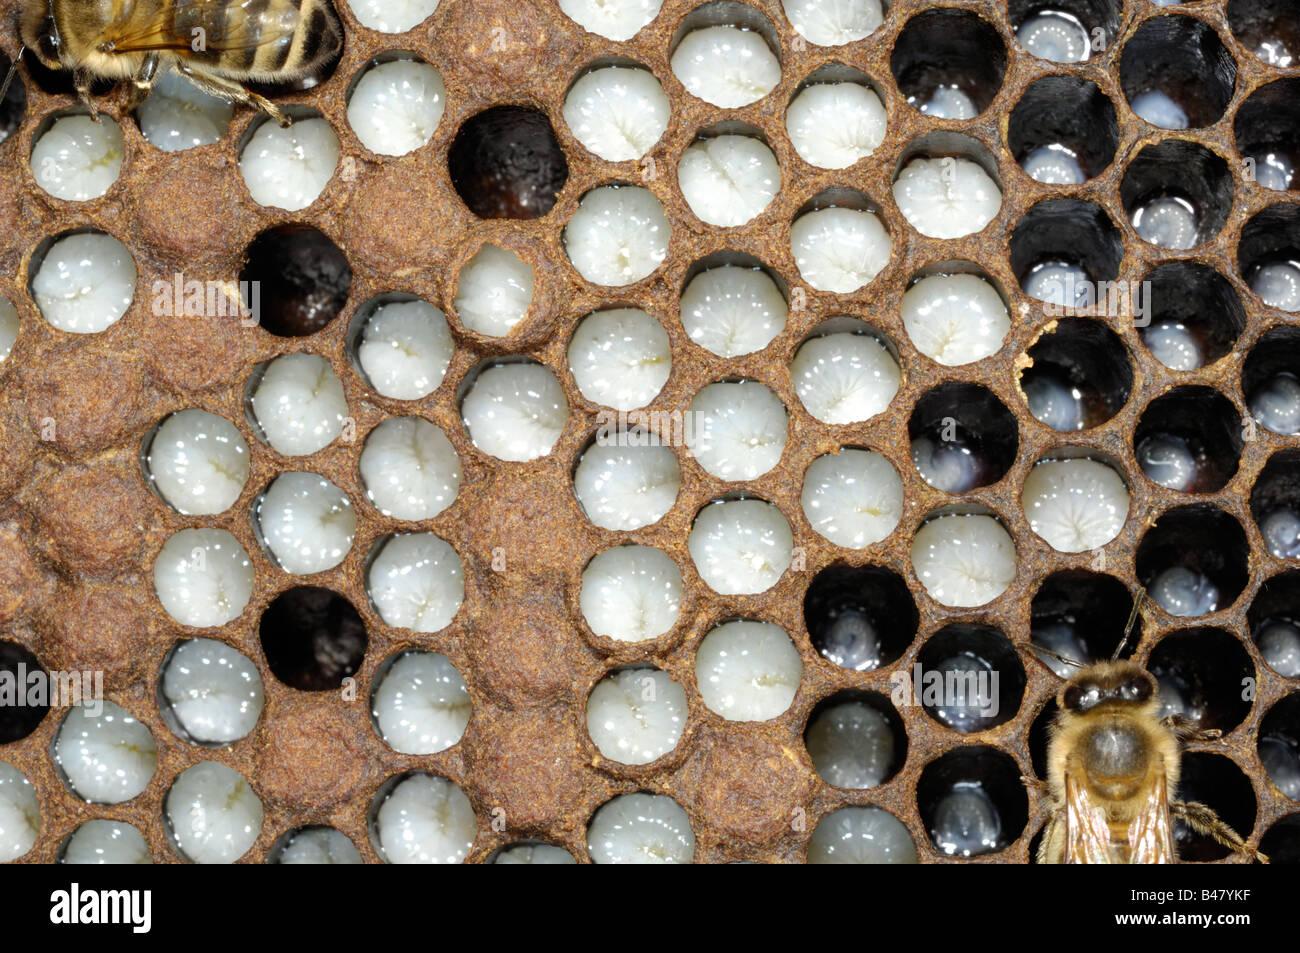 Western or European Honey bee brood chamber showing larvae Norfok UK September - Stock Image